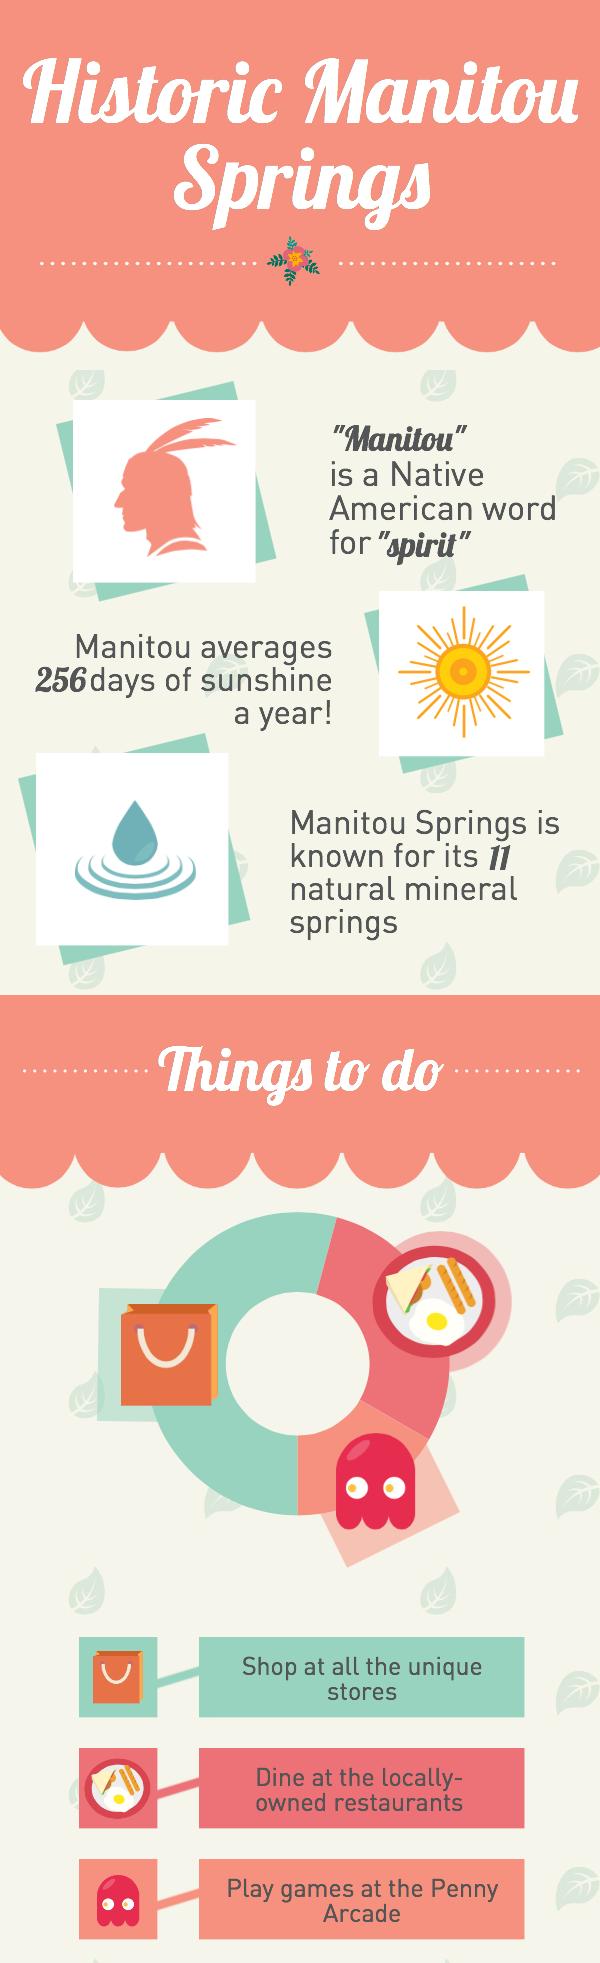 Historic Manitou Springs #manitousprings Historic Manitou Springs! #manitousprings